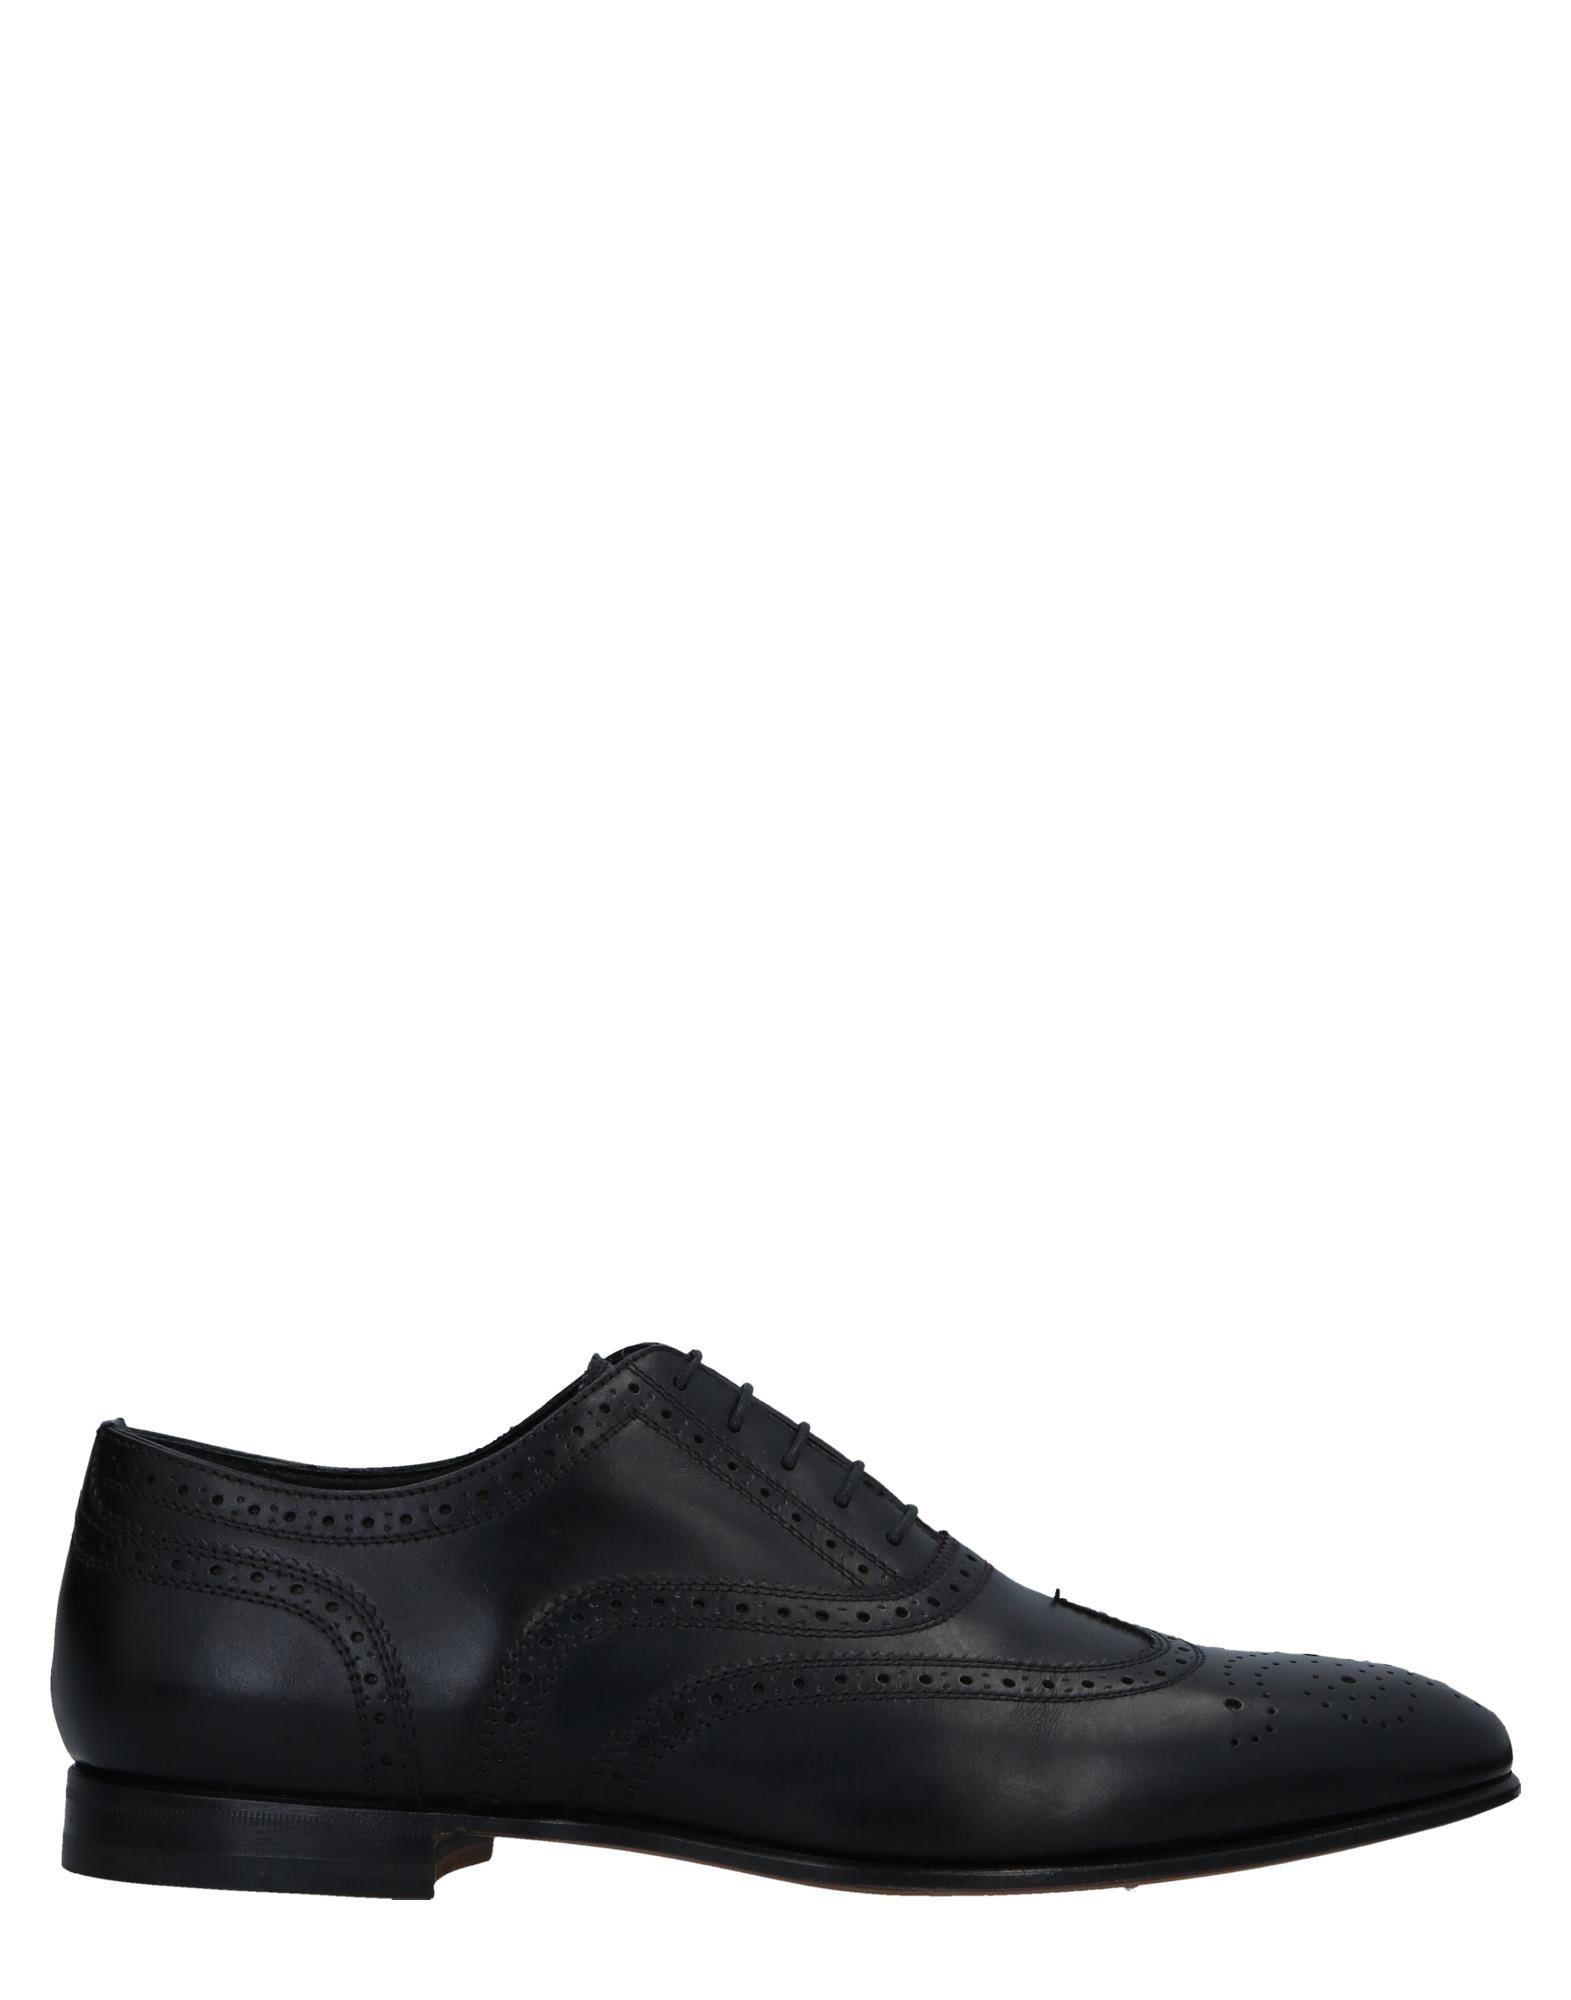 Rabatt echte Schuhe J. Holbens Schnürschuhe Herren  11520070XH